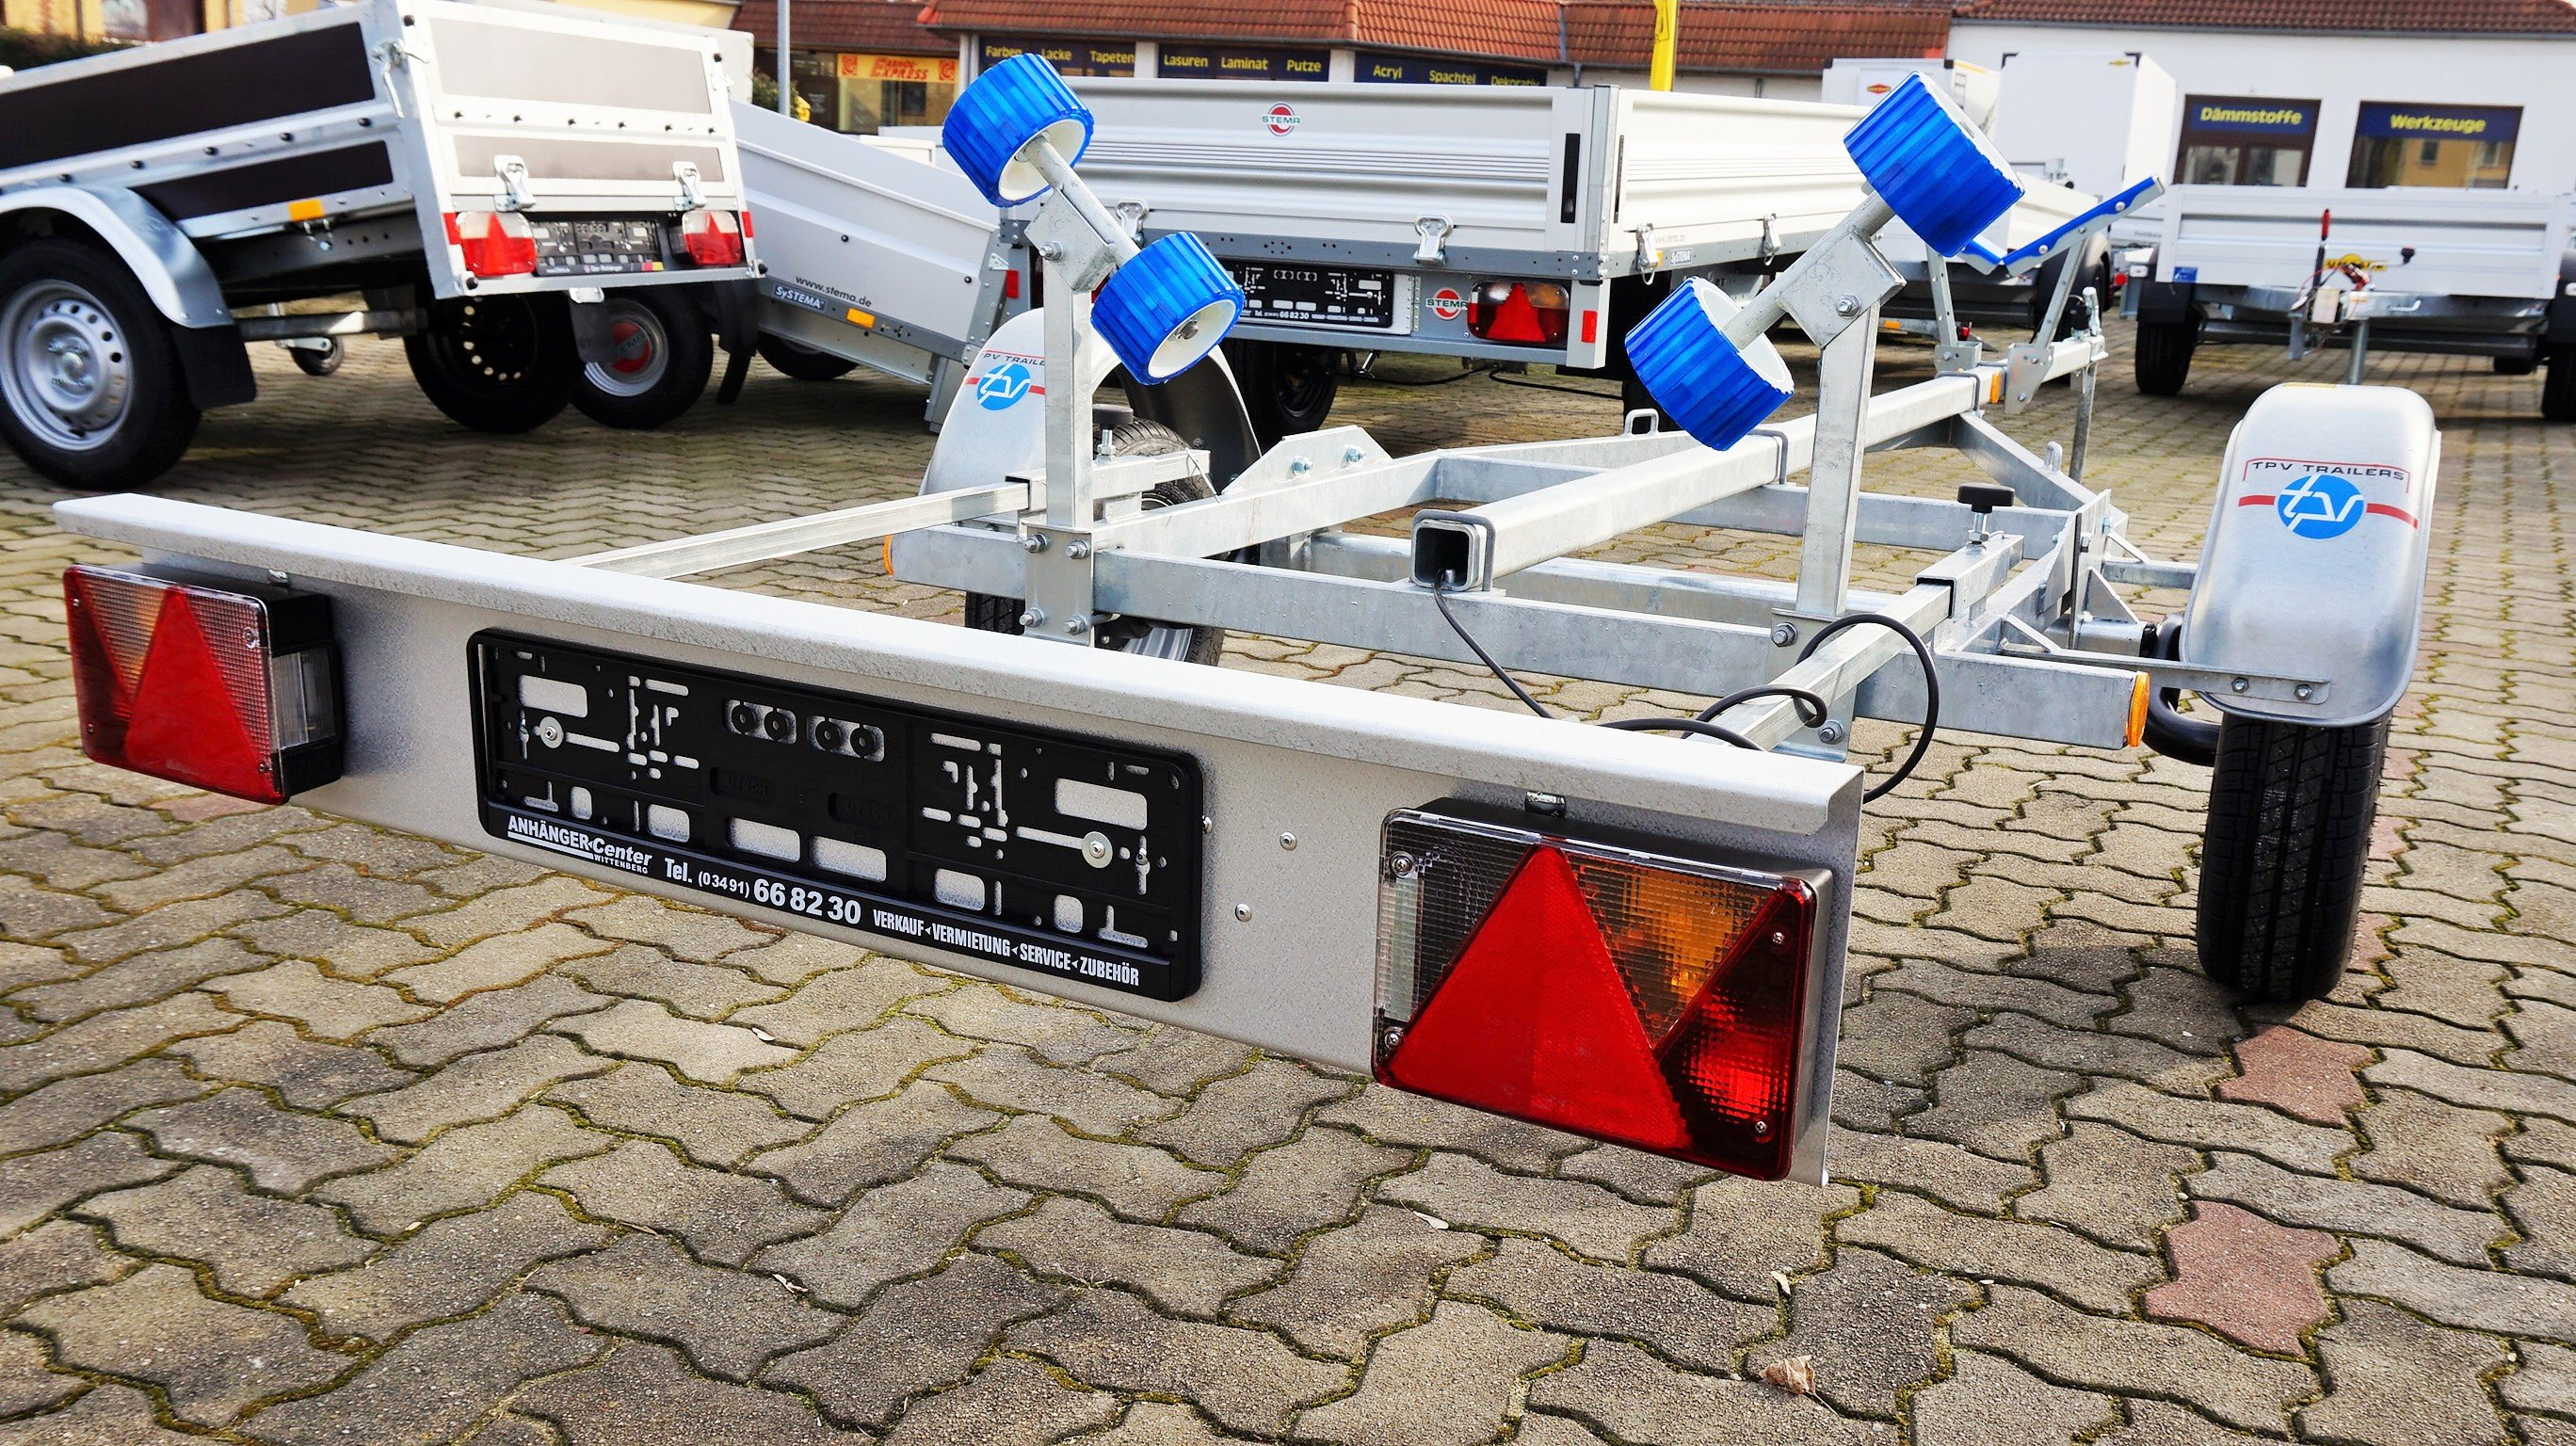 Nett Anhänger Lichtanschluss Bilder - Elektrische Schaltplan-Ideen ...